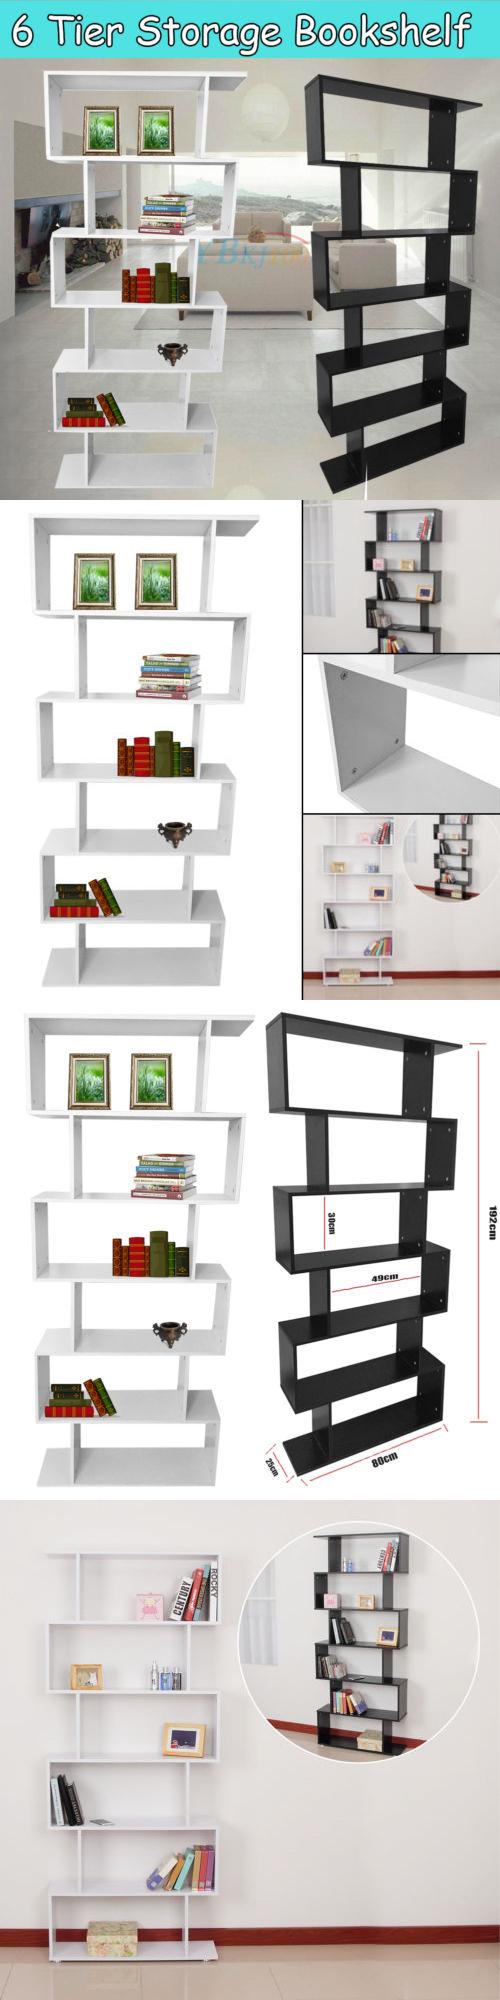 Bookcases display shelf storage bookshelf level tier ladder